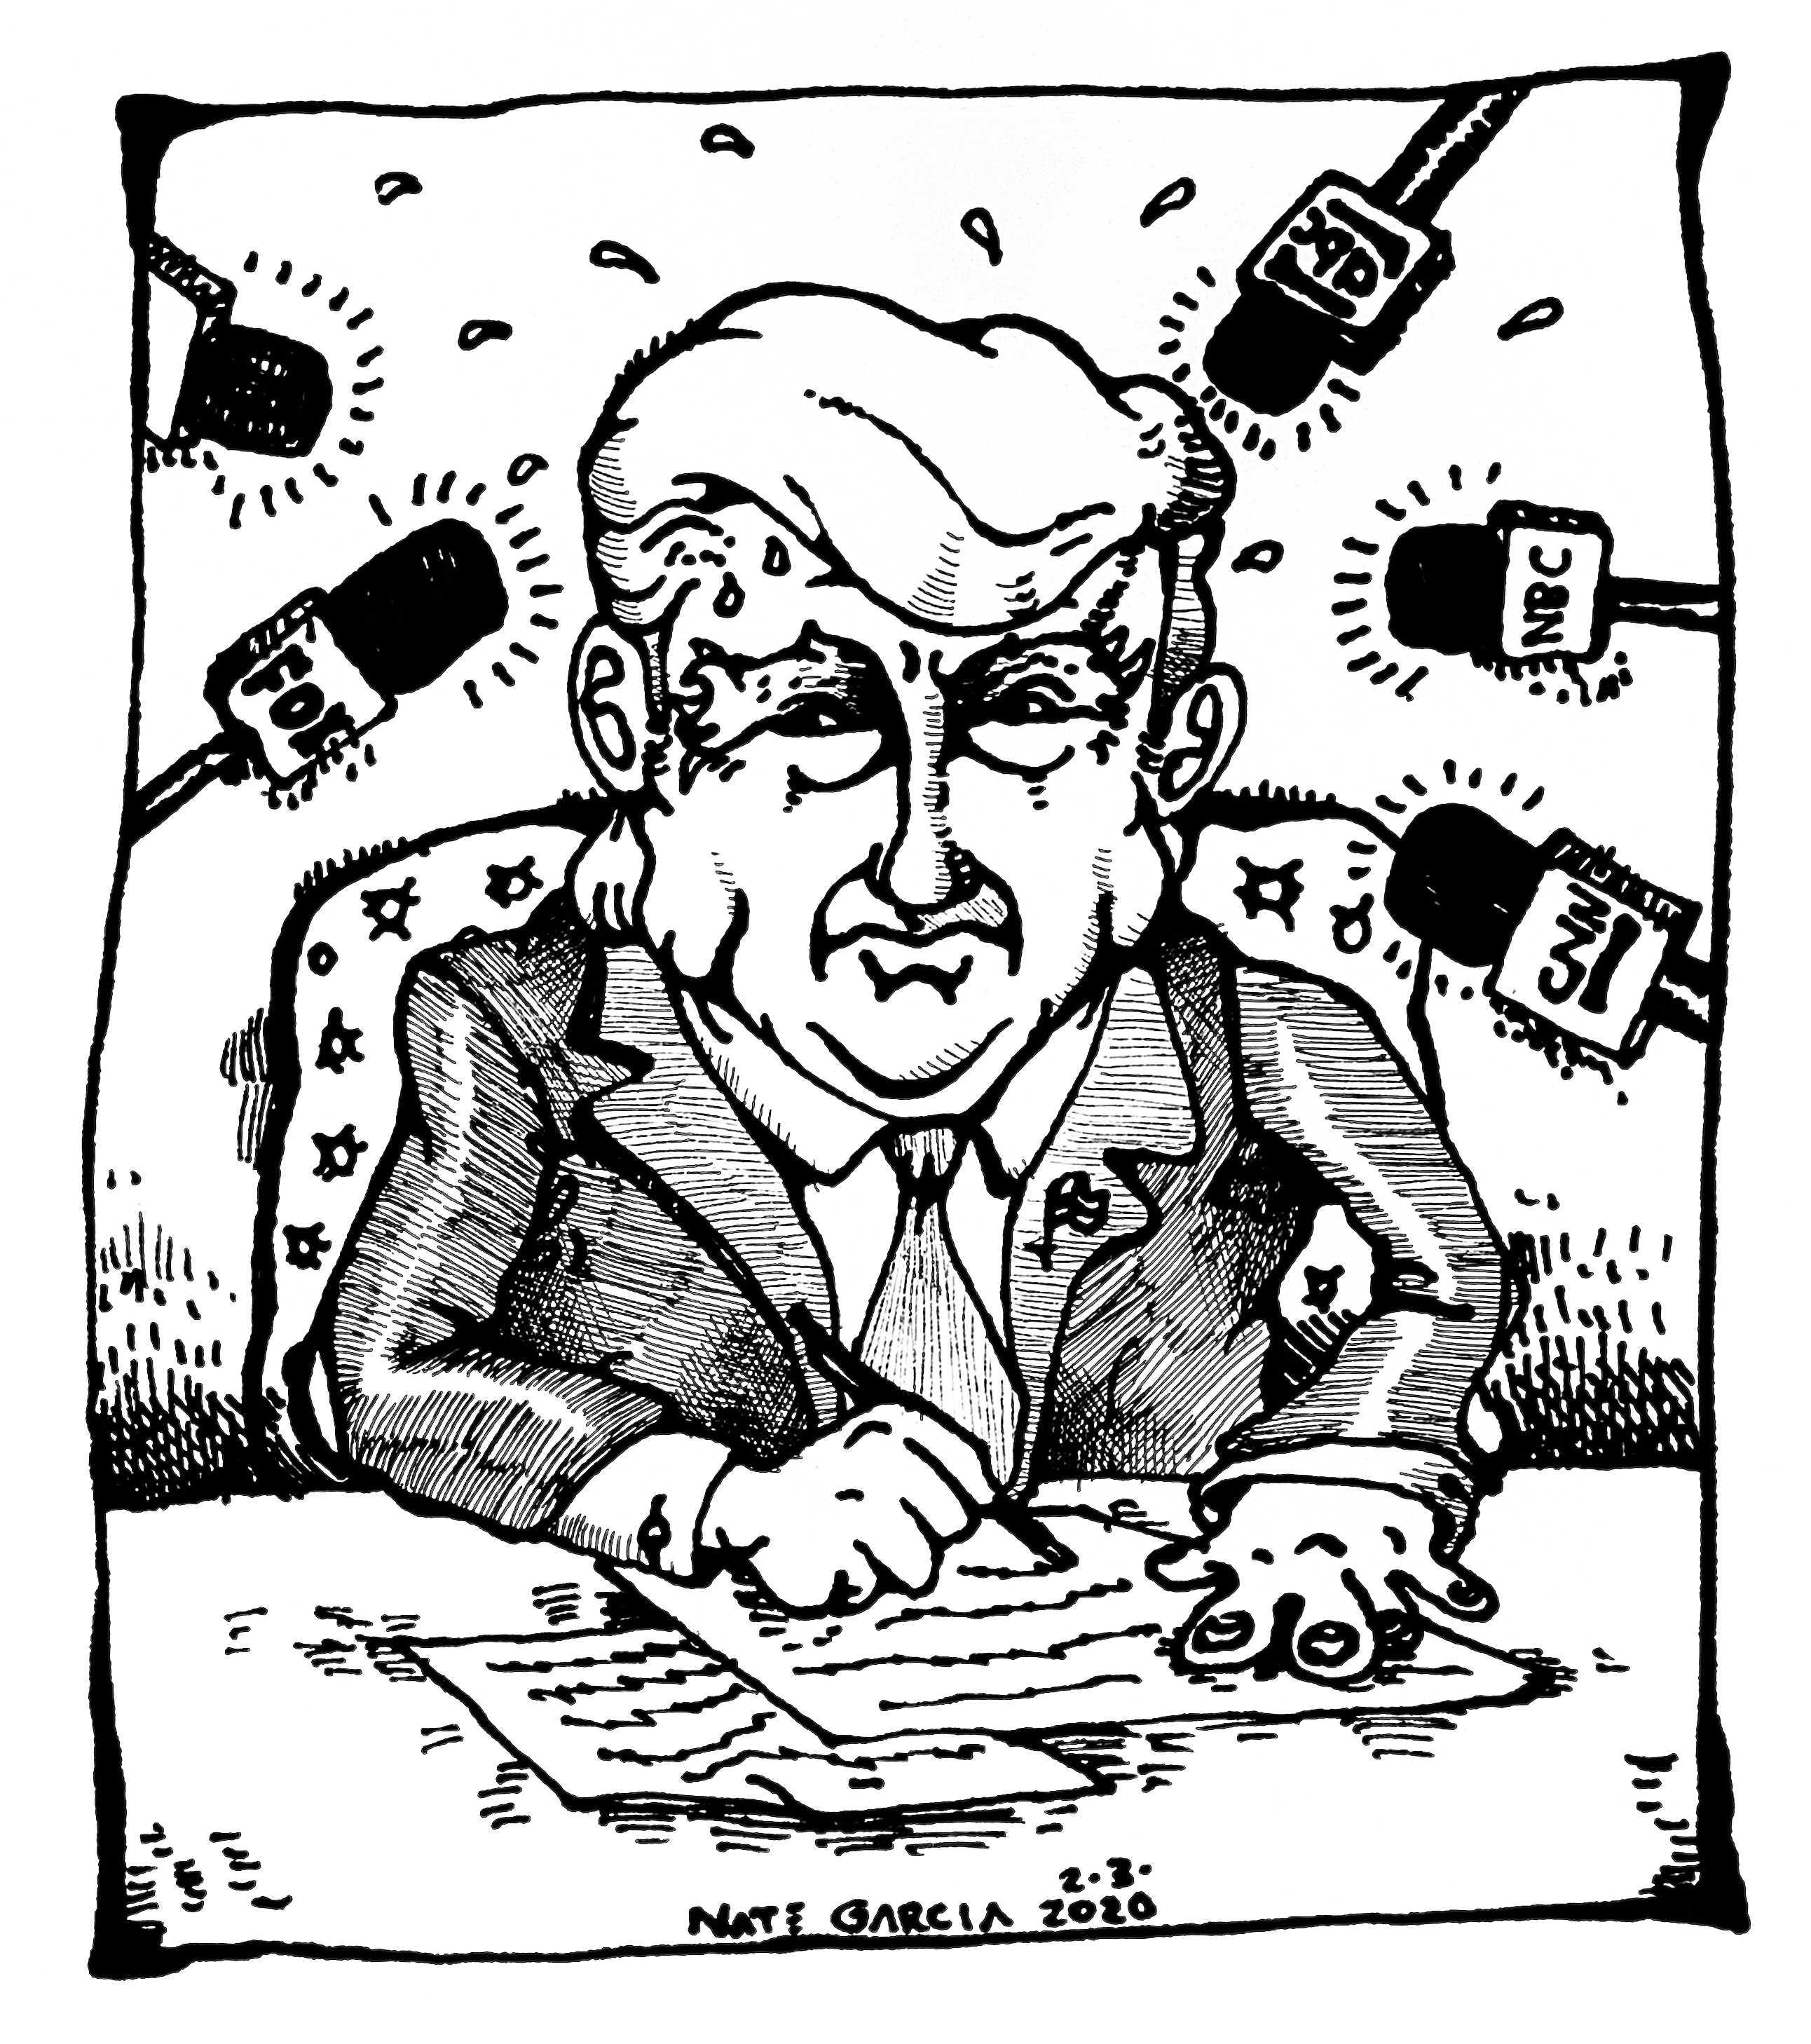 Cartoon by Nate Garcia